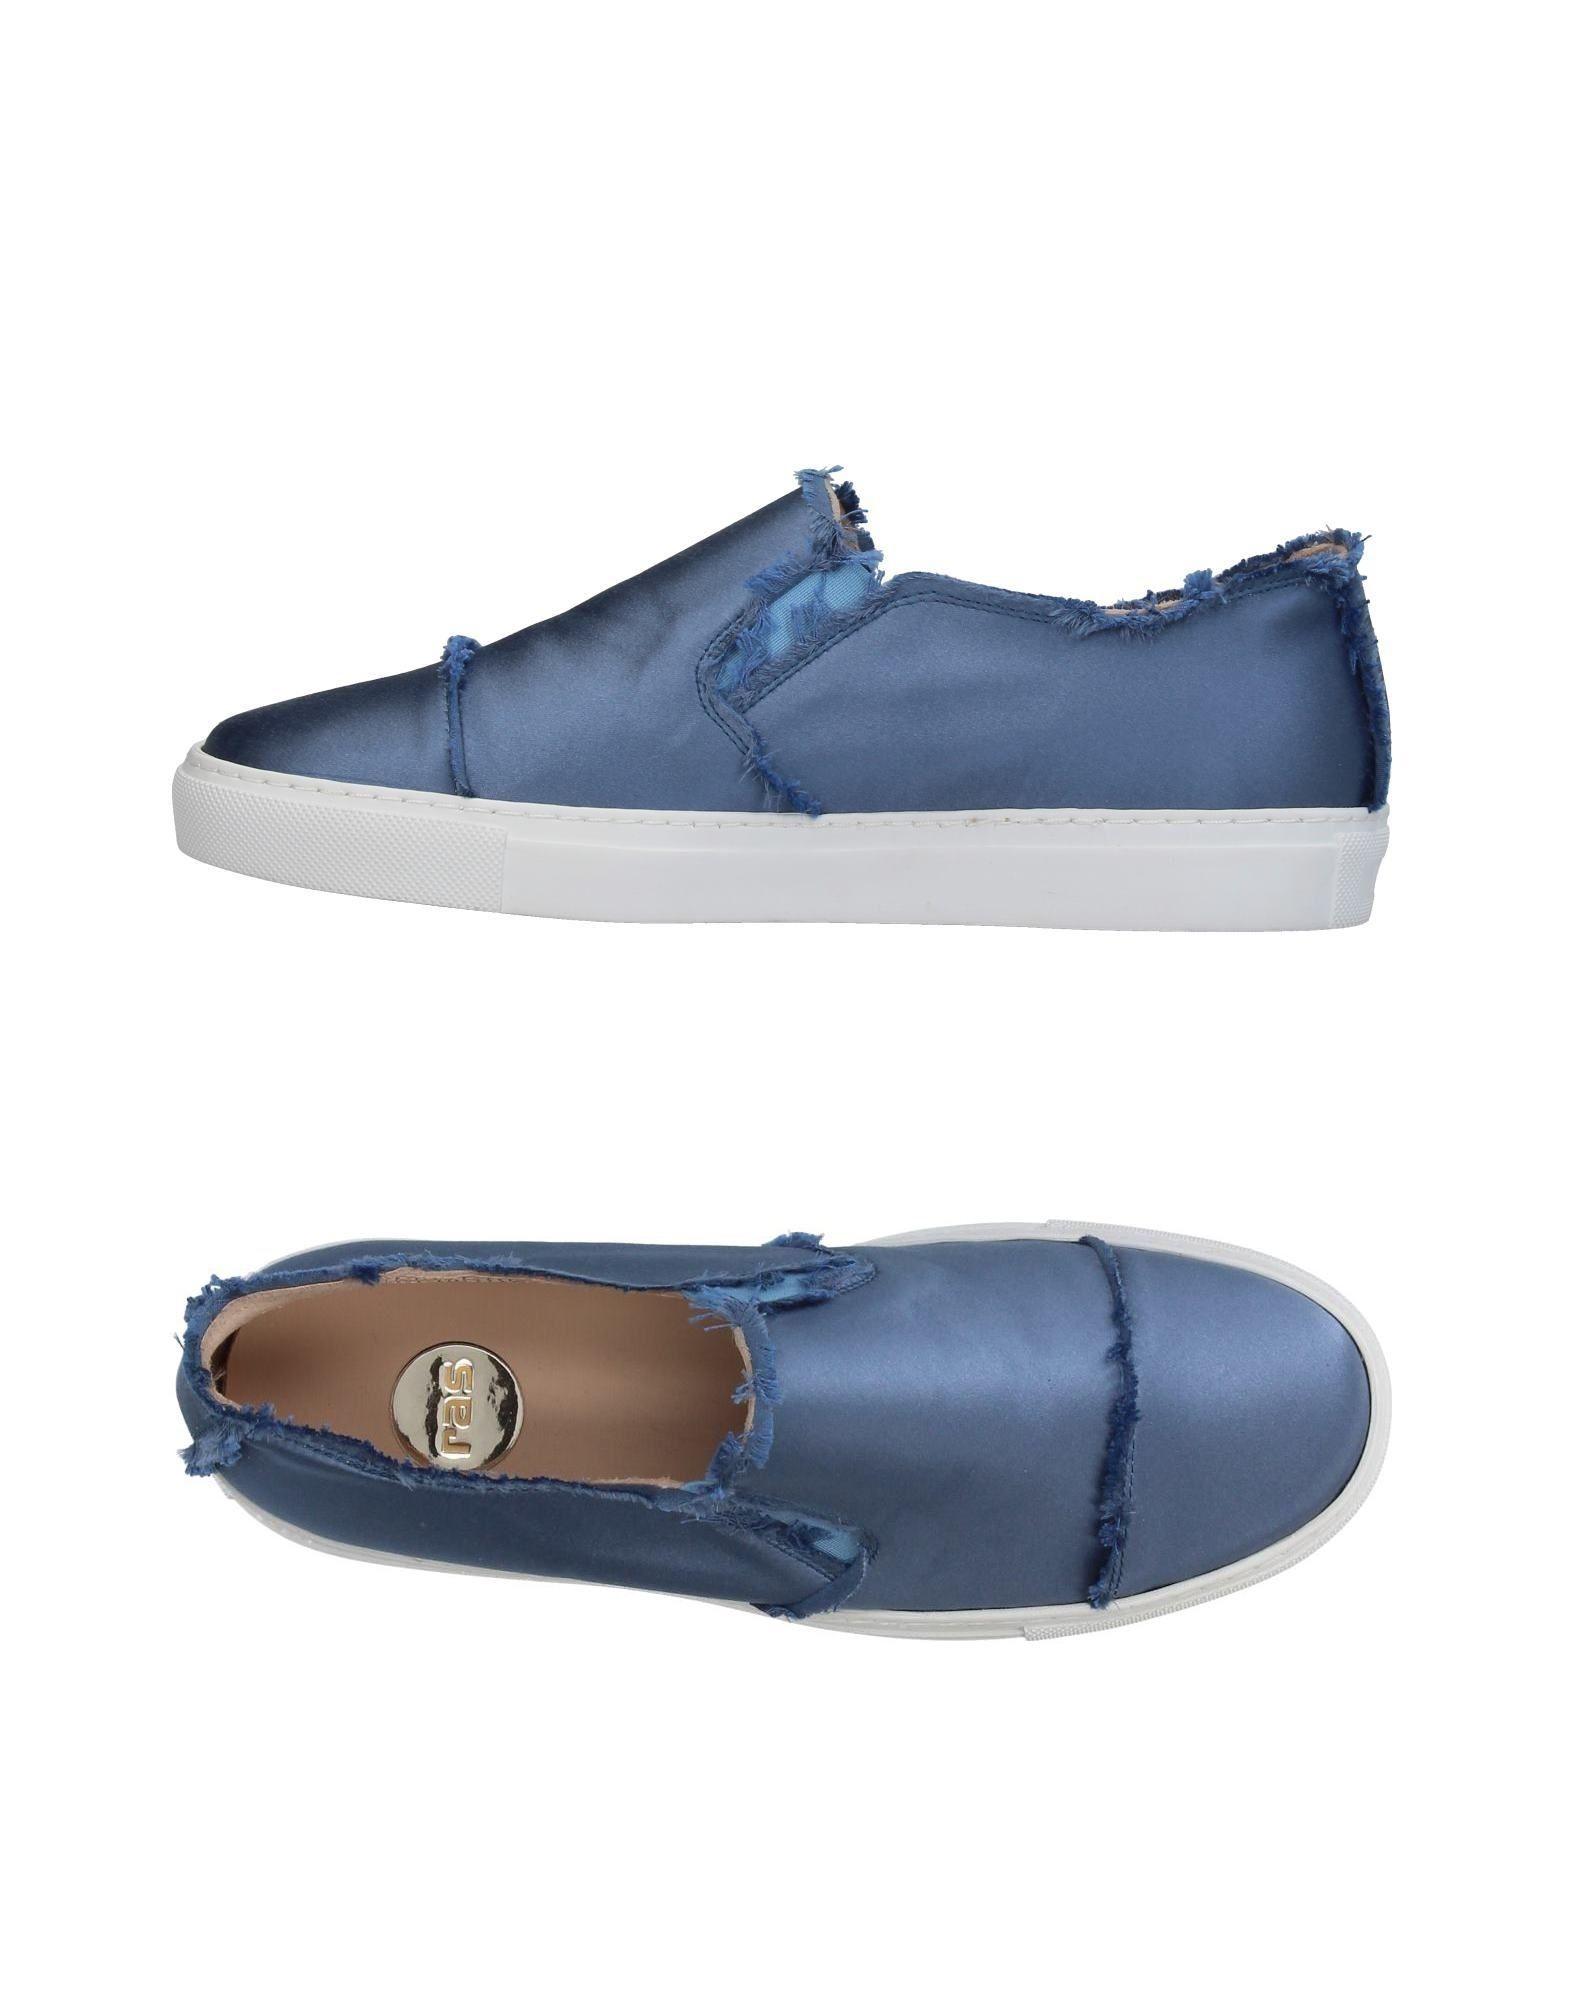 Moda Sneakers Ras Donna - 11408556OH